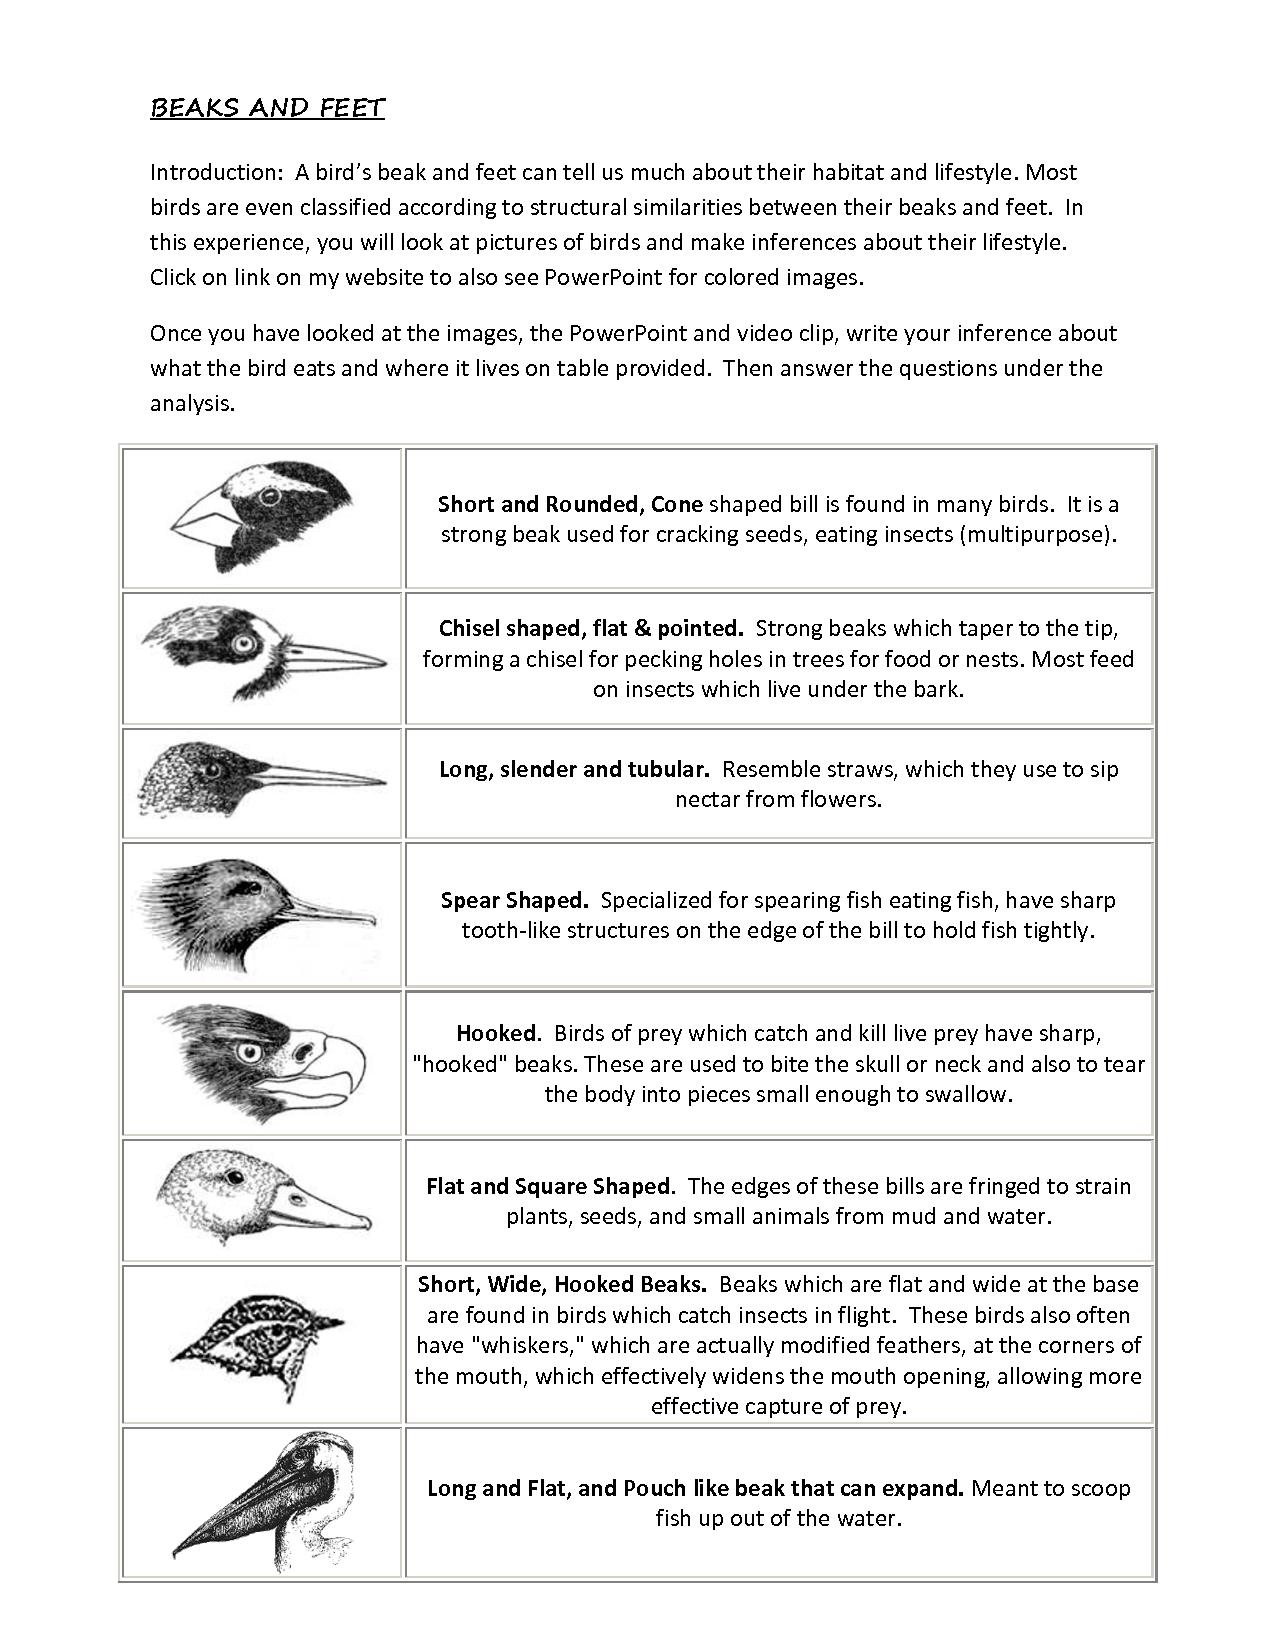 Worksheets Adaptation Worksheet evolution adaptation matching worksheet google search bente types of birds for kids search